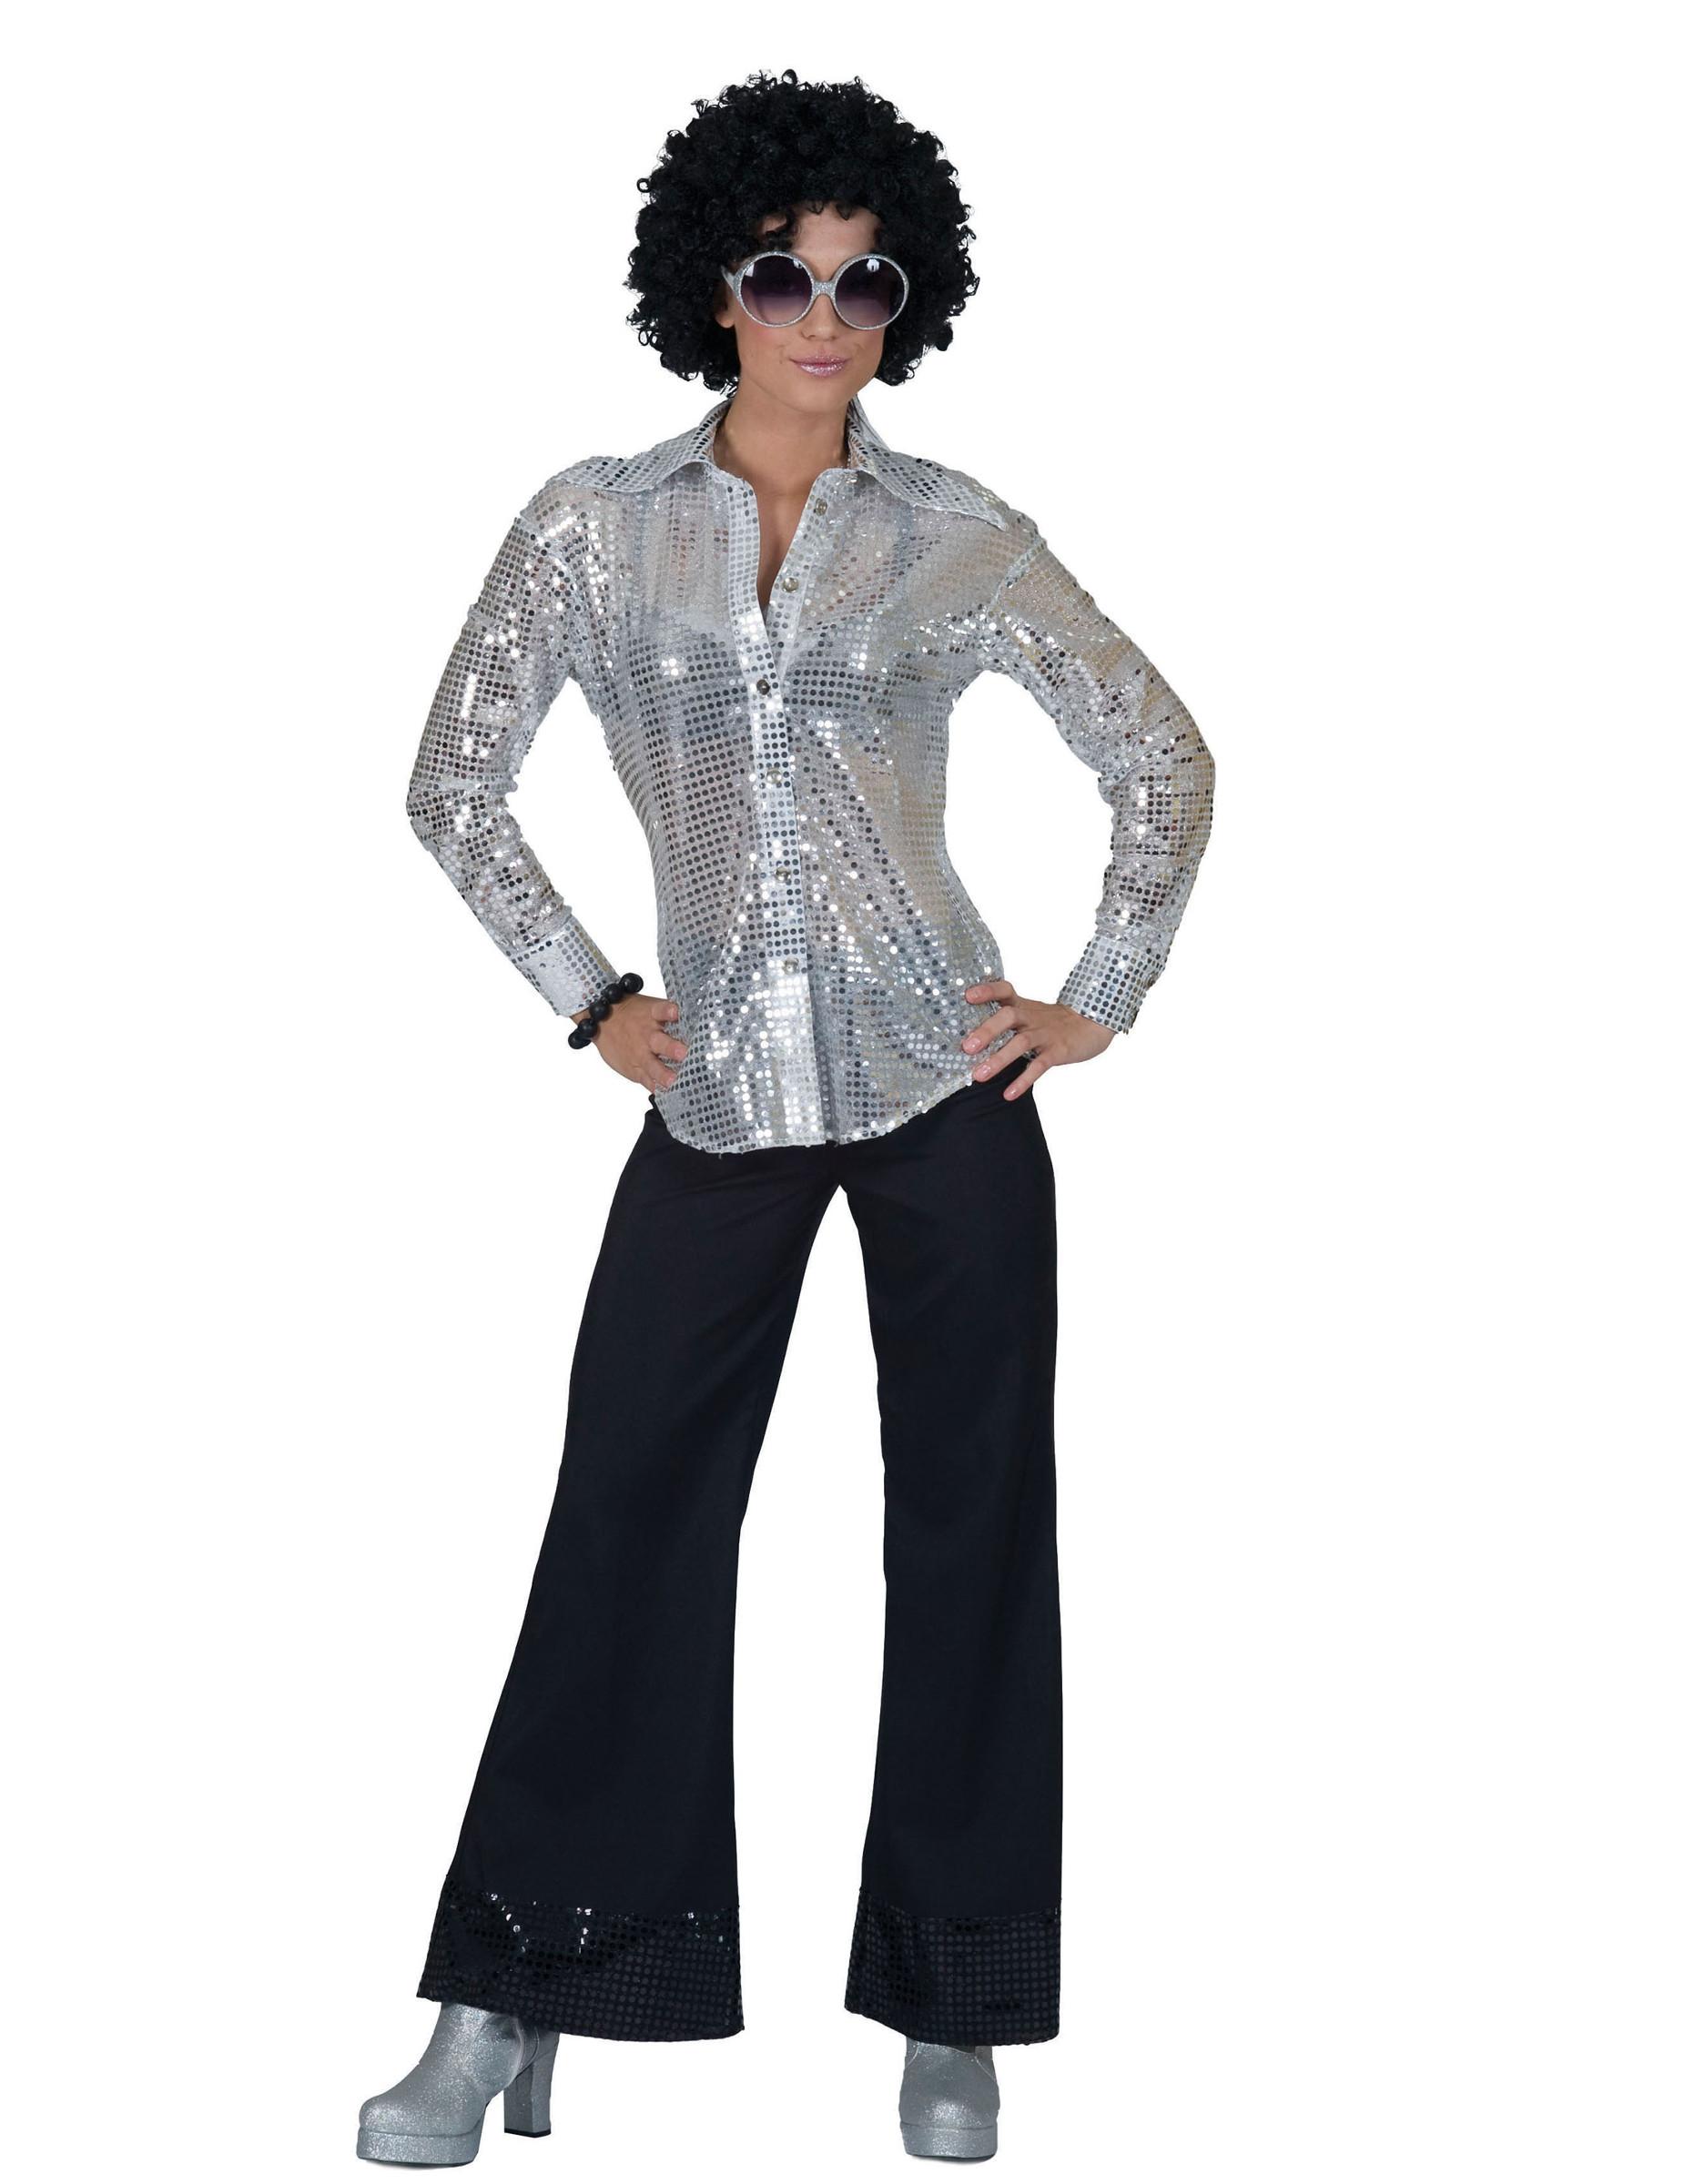 damen disco hemd mit pailletten silber g nstige faschings kost me bei karneval megastore. Black Bedroom Furniture Sets. Home Design Ideas